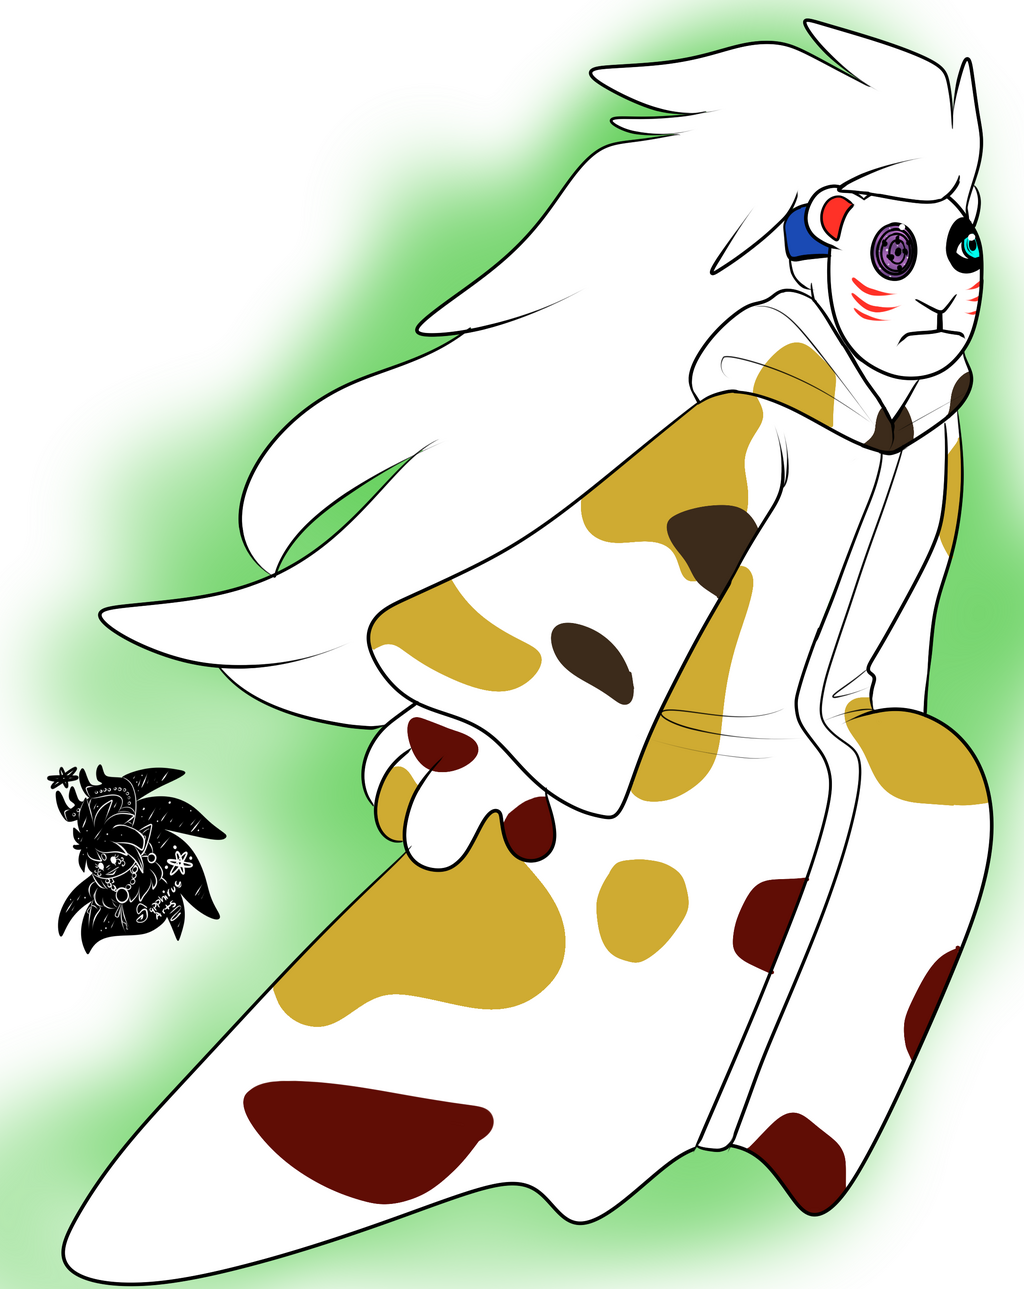 The Male calico +Flatcolored Commission+